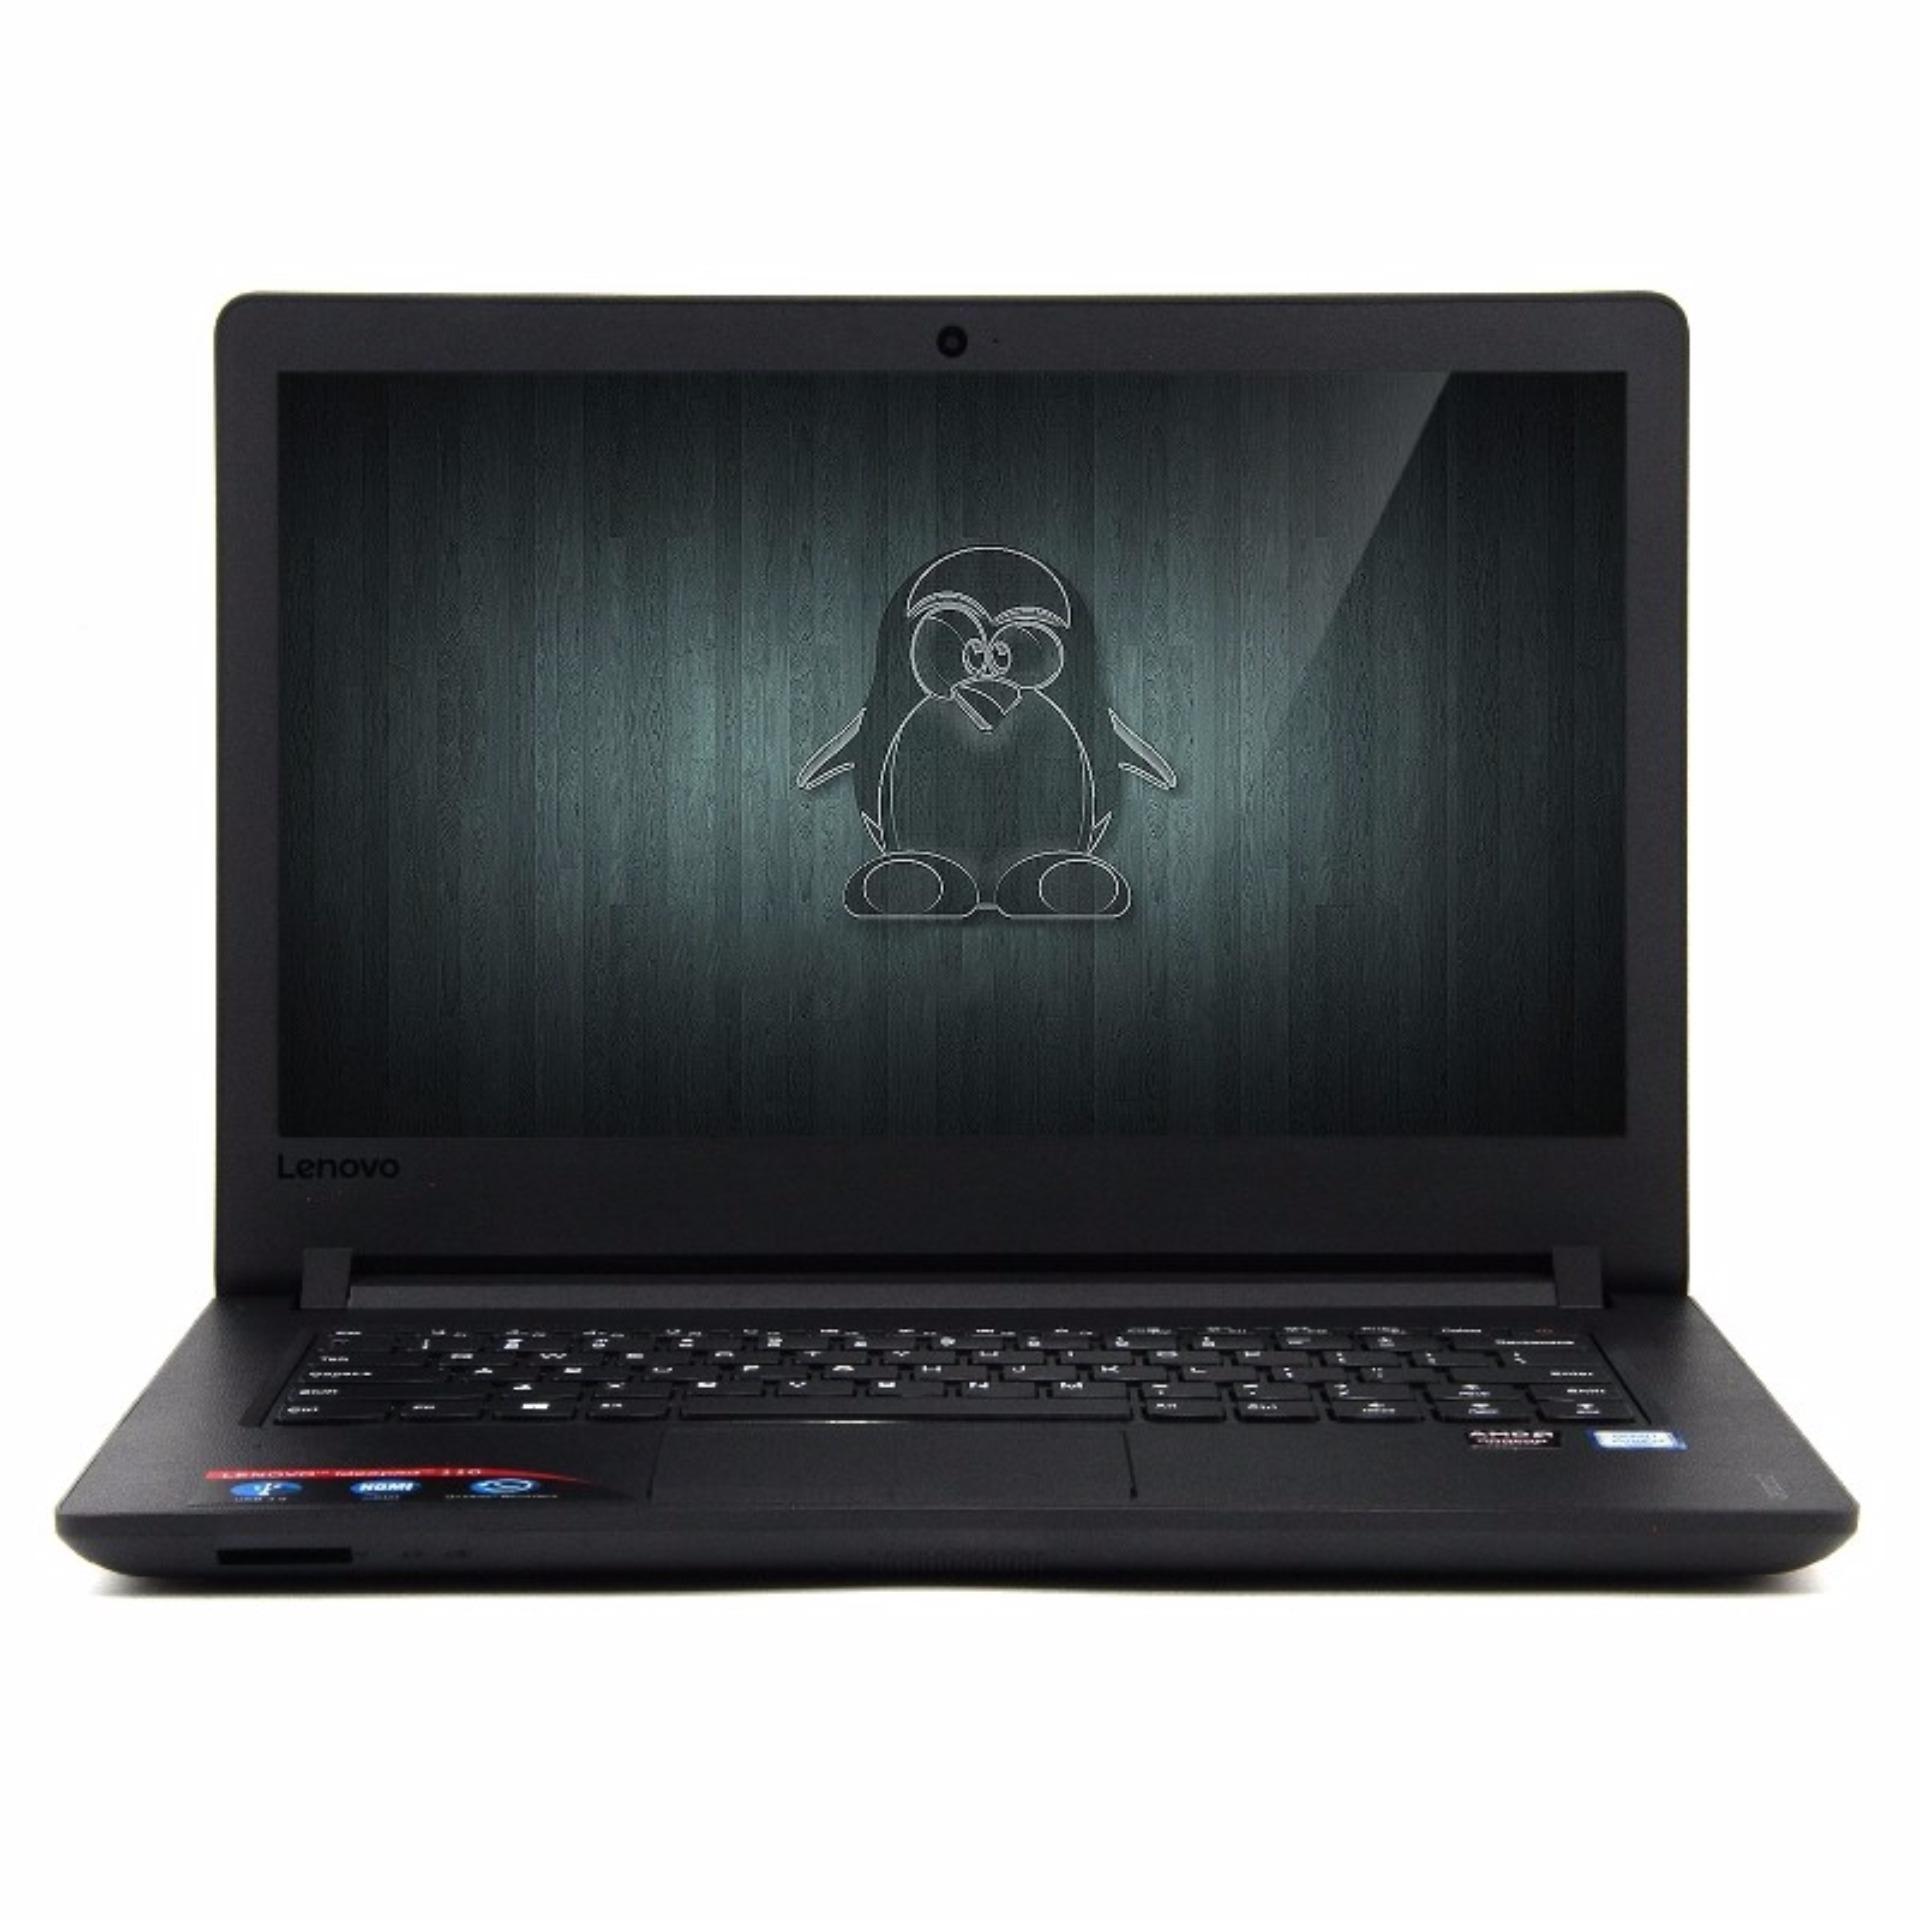 Lenovo Ideapad 110 14ast Amd A9 9400 Radeon R5 Ram 4gb 1tb 05id Promo Laptop 14isk I5 6200u